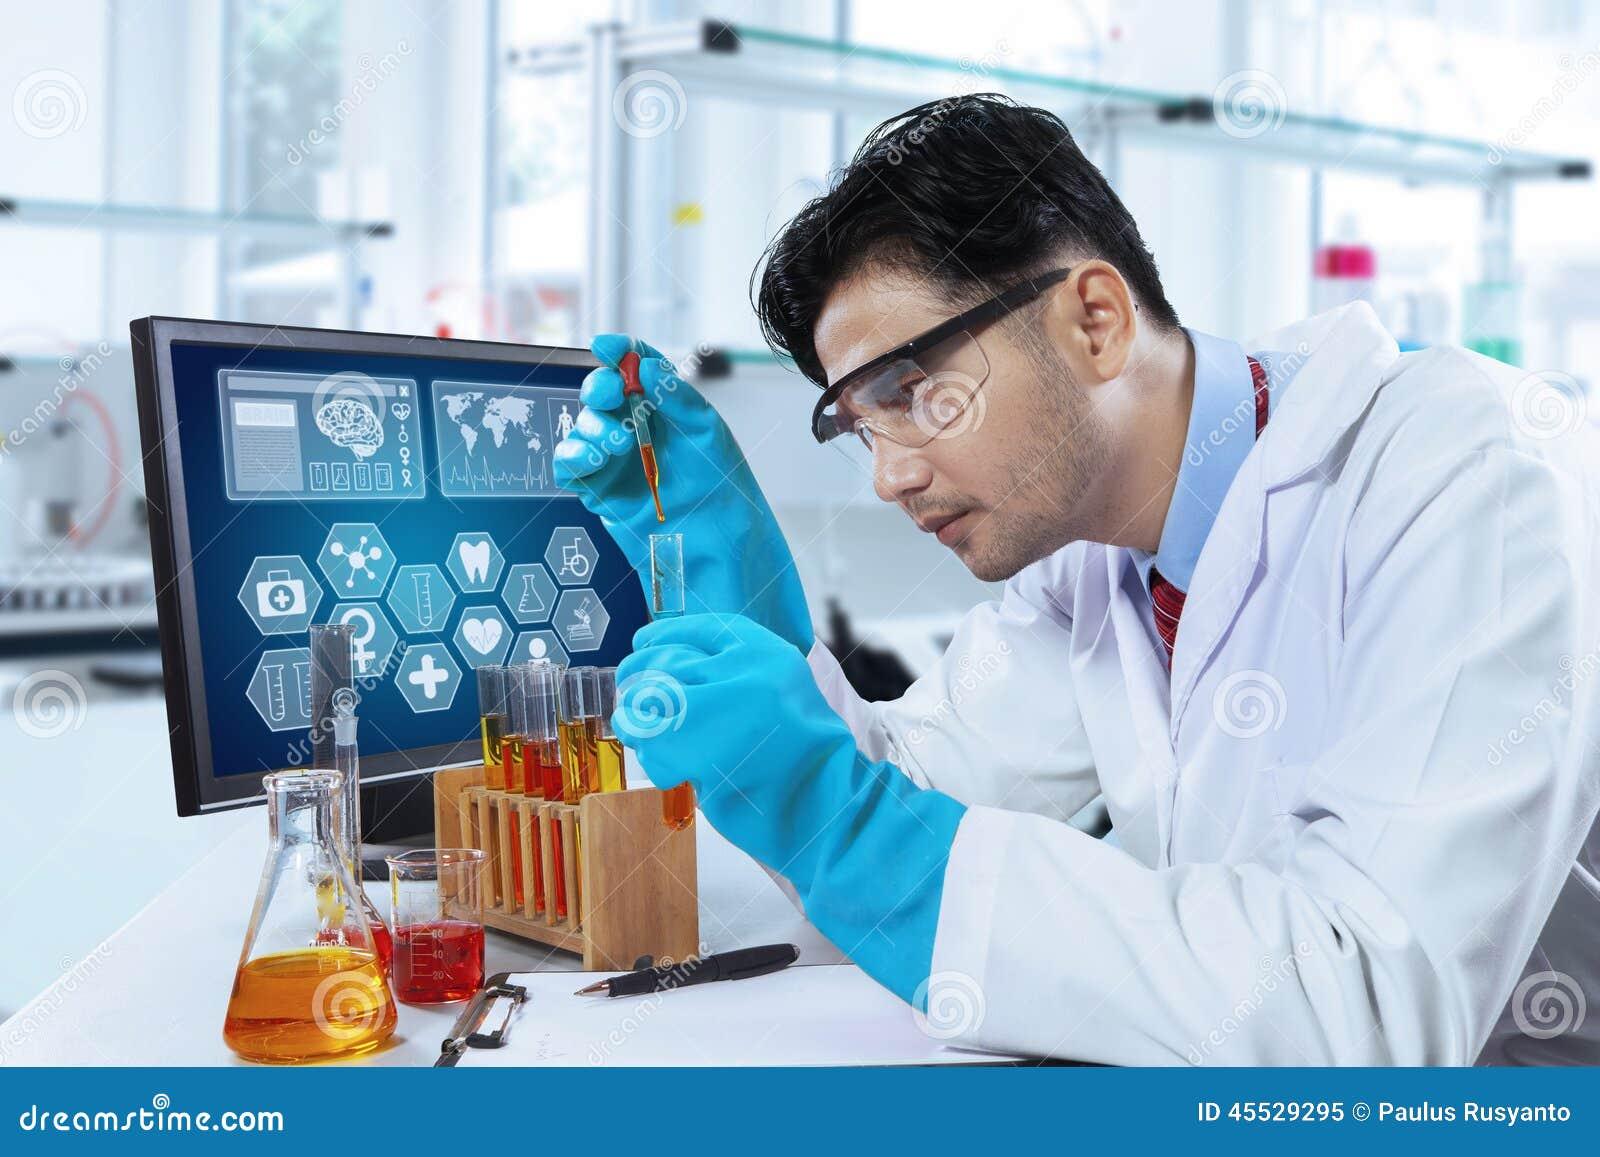 hispanic scientist working in laboratory stock photo image 45529295 discovery school clip art field trip discovery channel school clipart